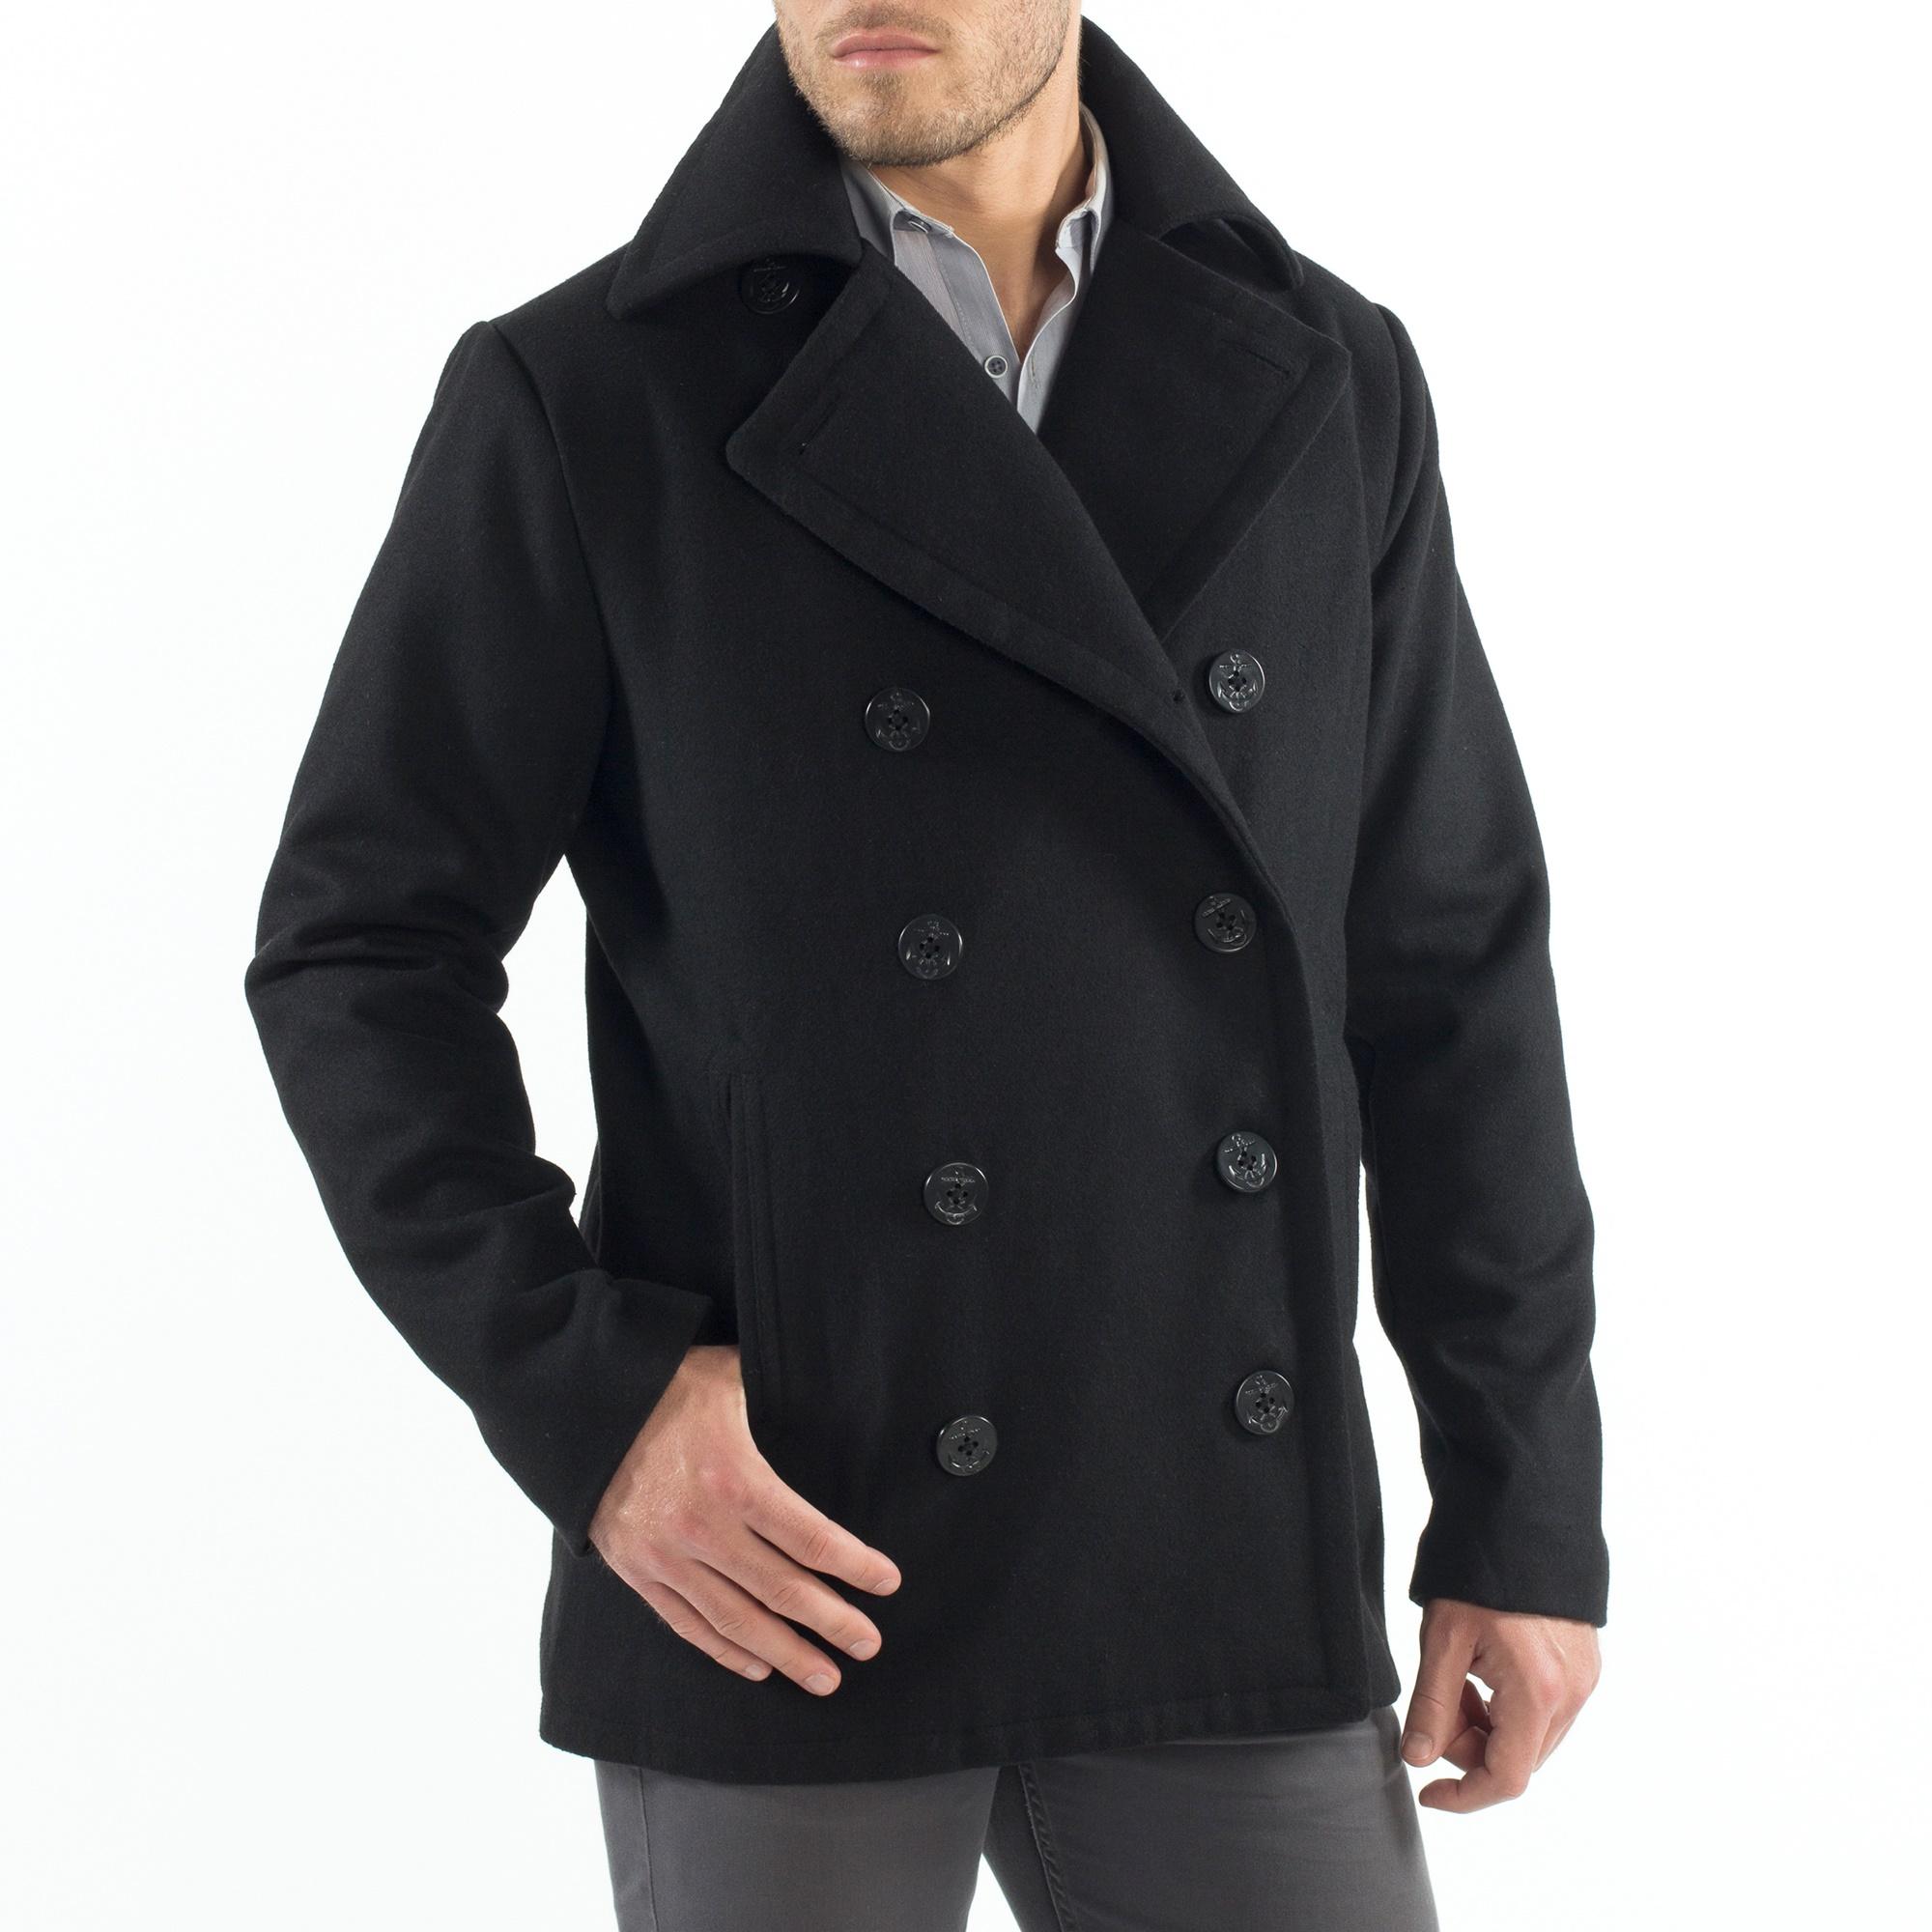 Alpine-Swiss-Mason-Mens-Wool-Blend-Pea-Coat-Jacket-Double-Breasted-Dress-Coat thumbnail 16